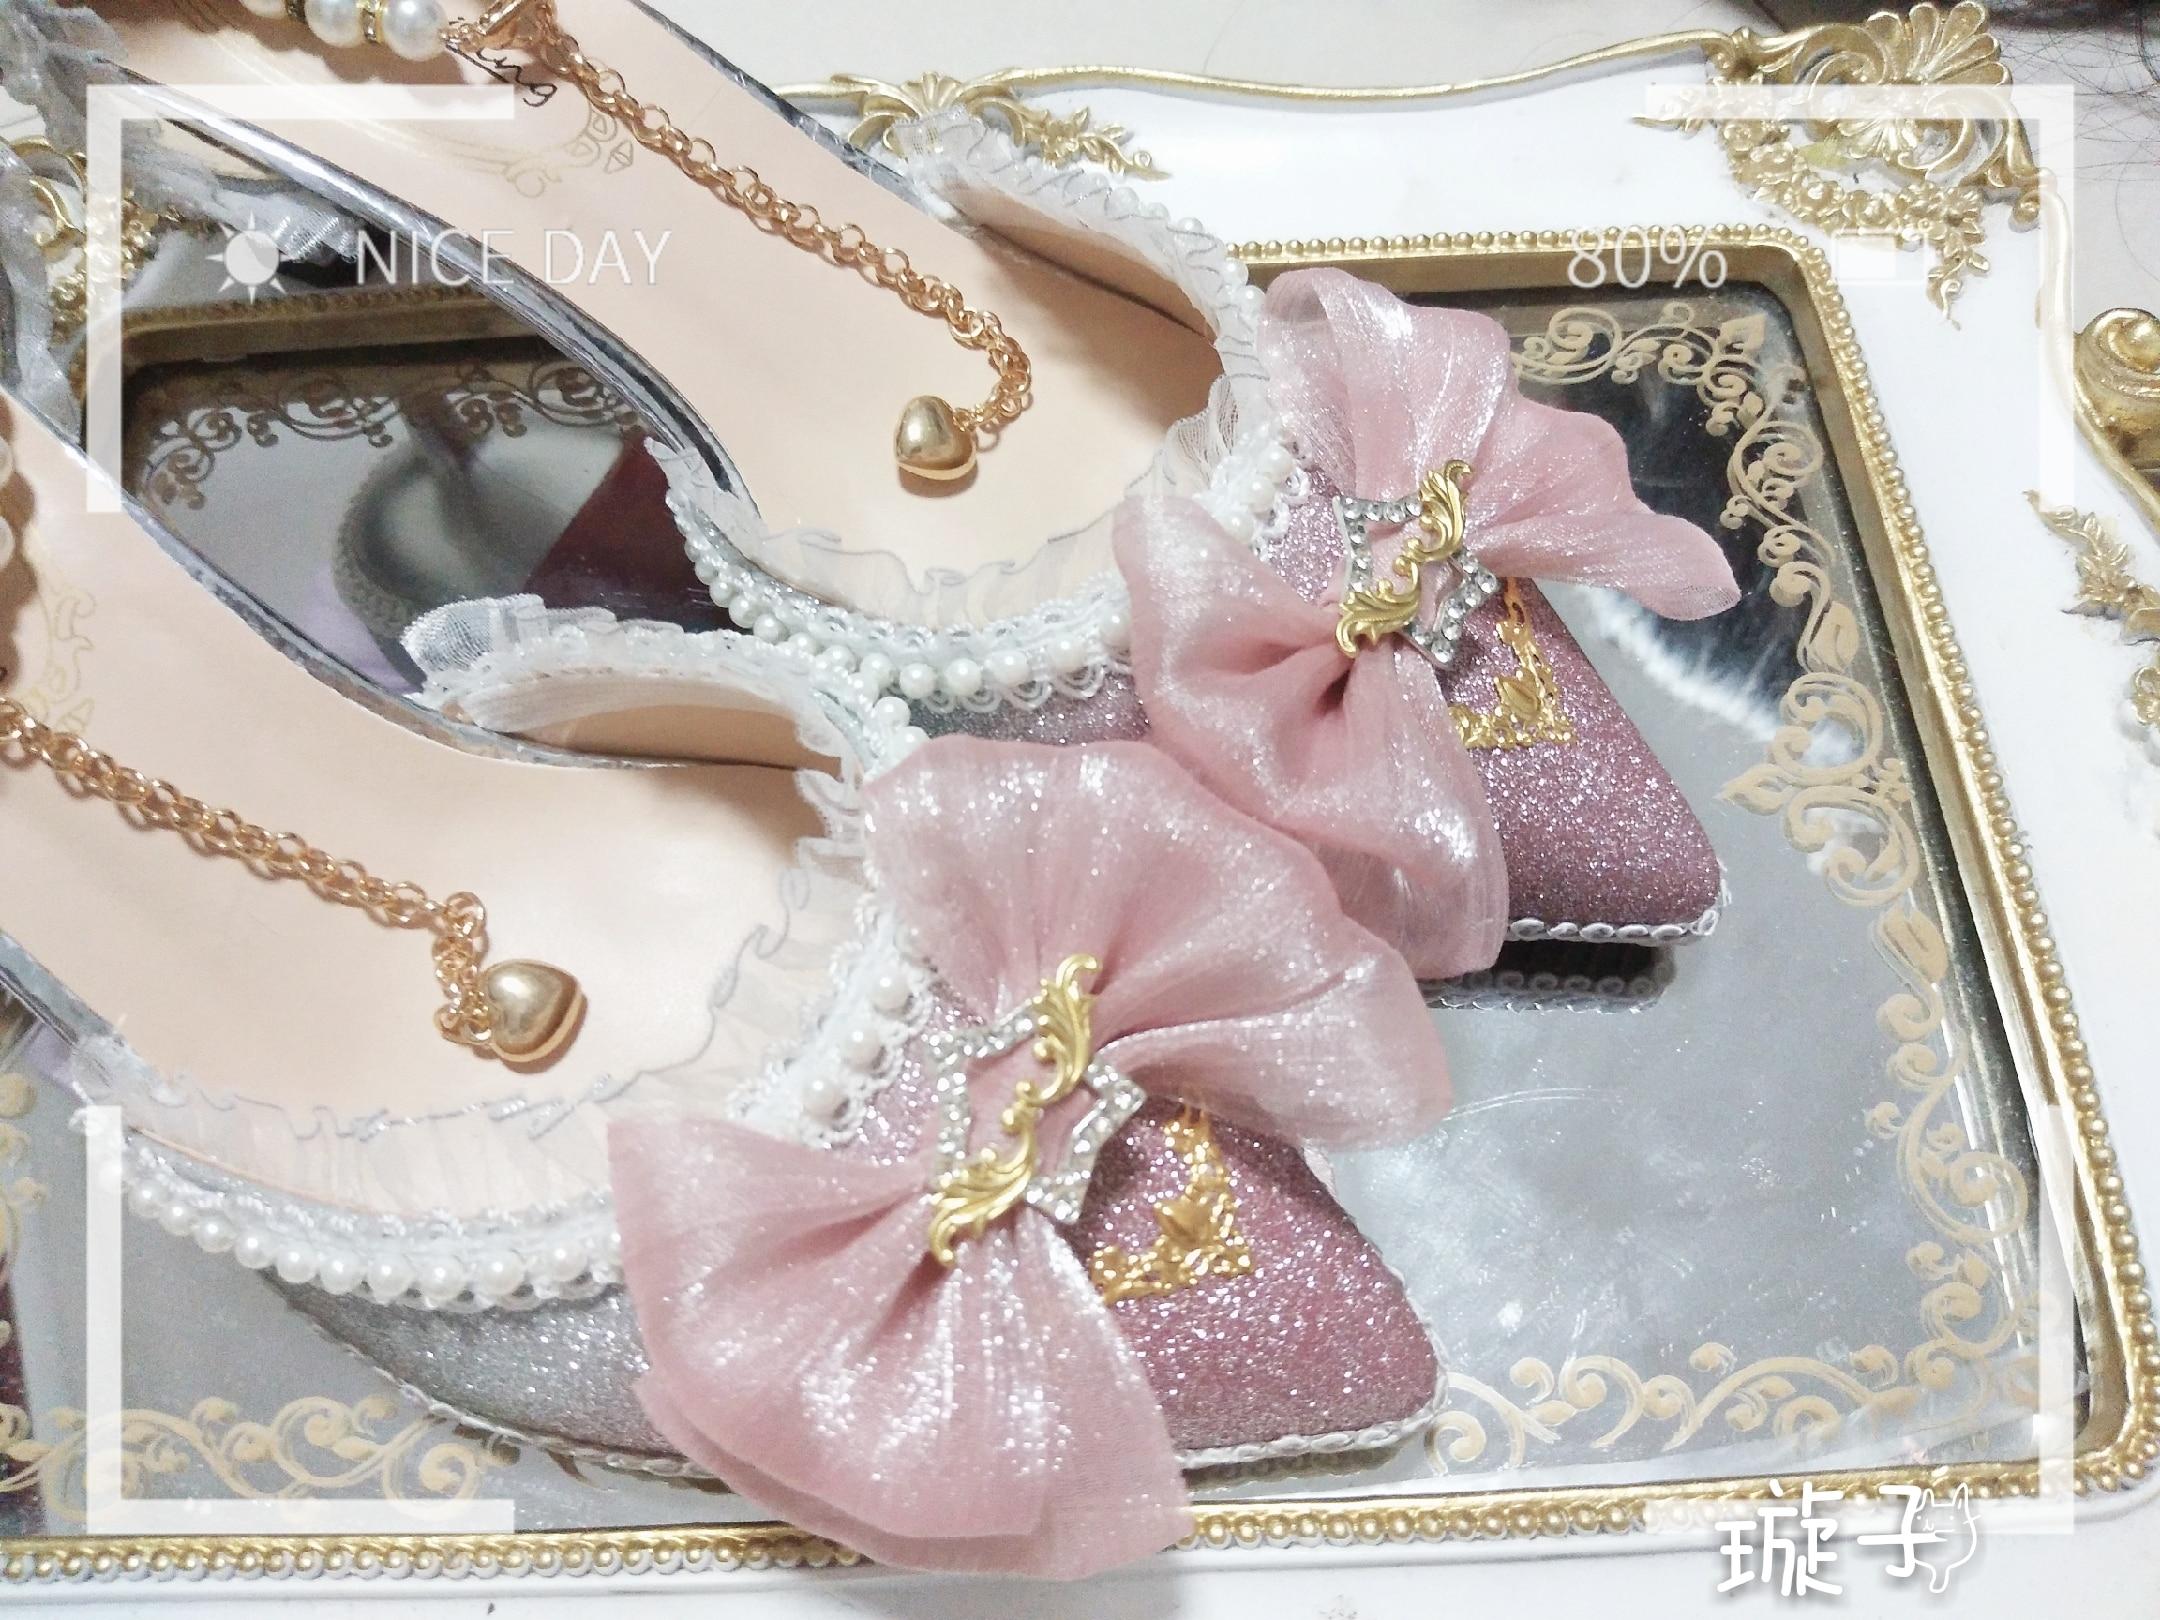 Sweet lolita zapatos vintage cabeza redonda zapatos de tacón bajo para mujer cute bowknot Cruz vendaje kawaii zapatos loli cosplay kawaii chica